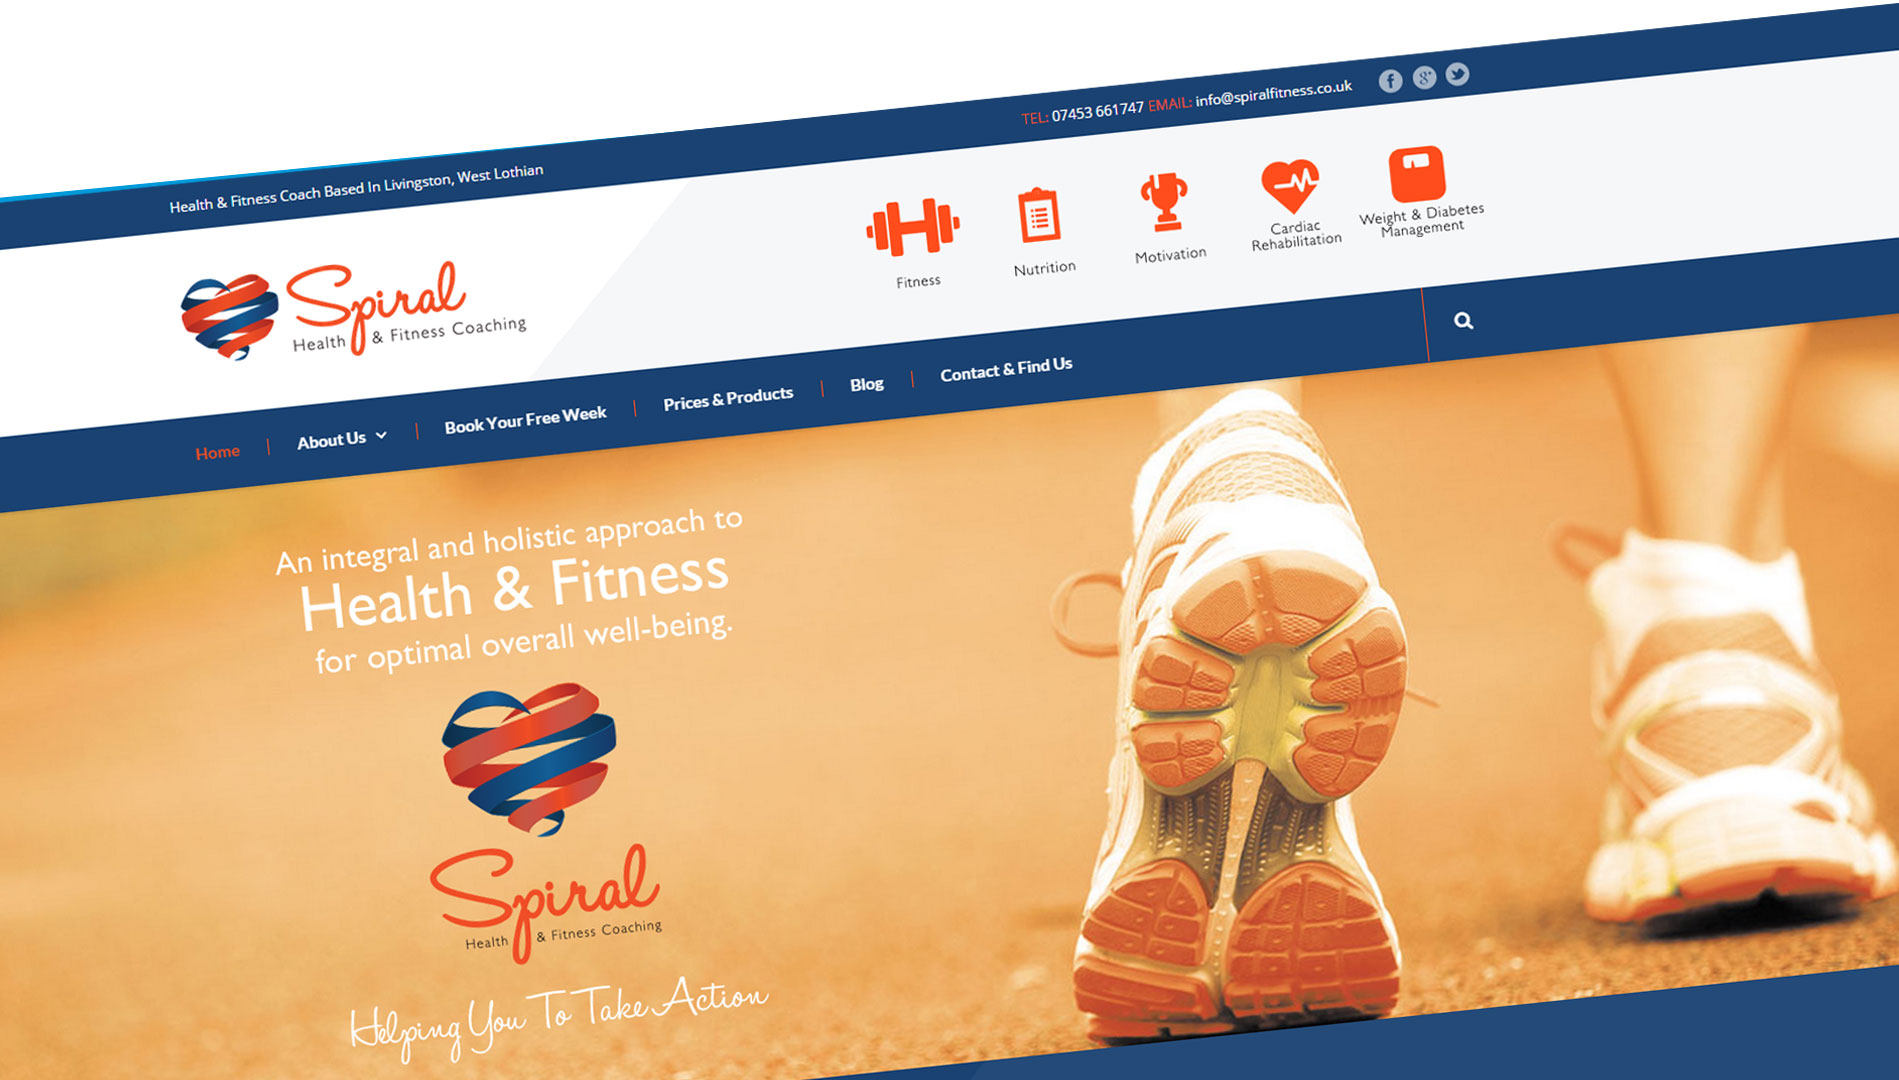 Spiral Health & Fitness